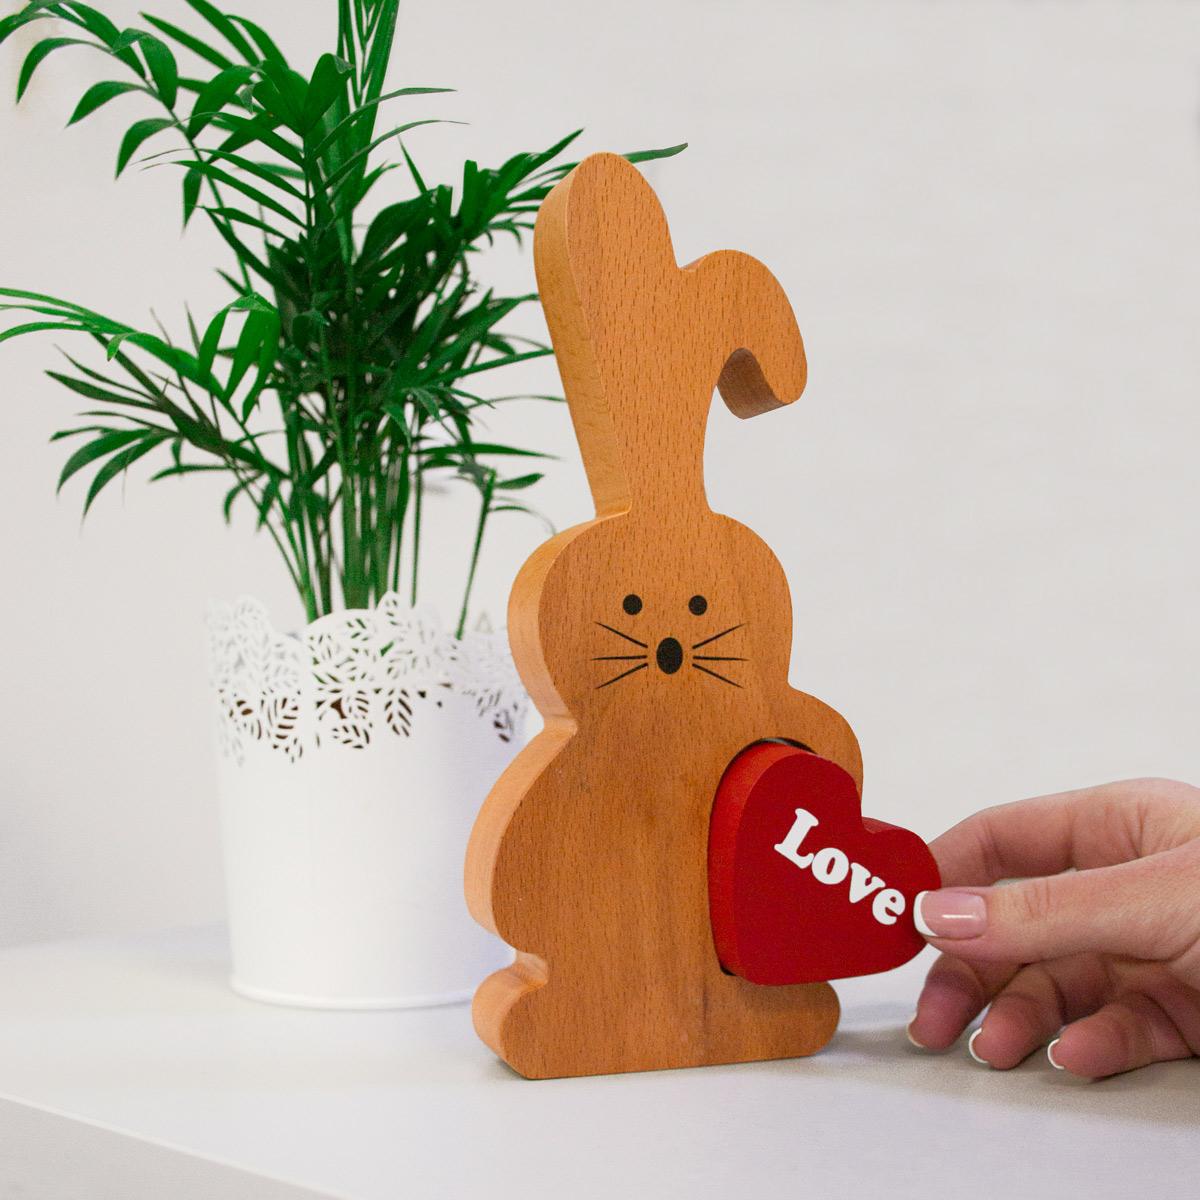 Фигурка декоративная Дубравия Заяц с сердцем, SVE-101-001, Дерево сувенир 48